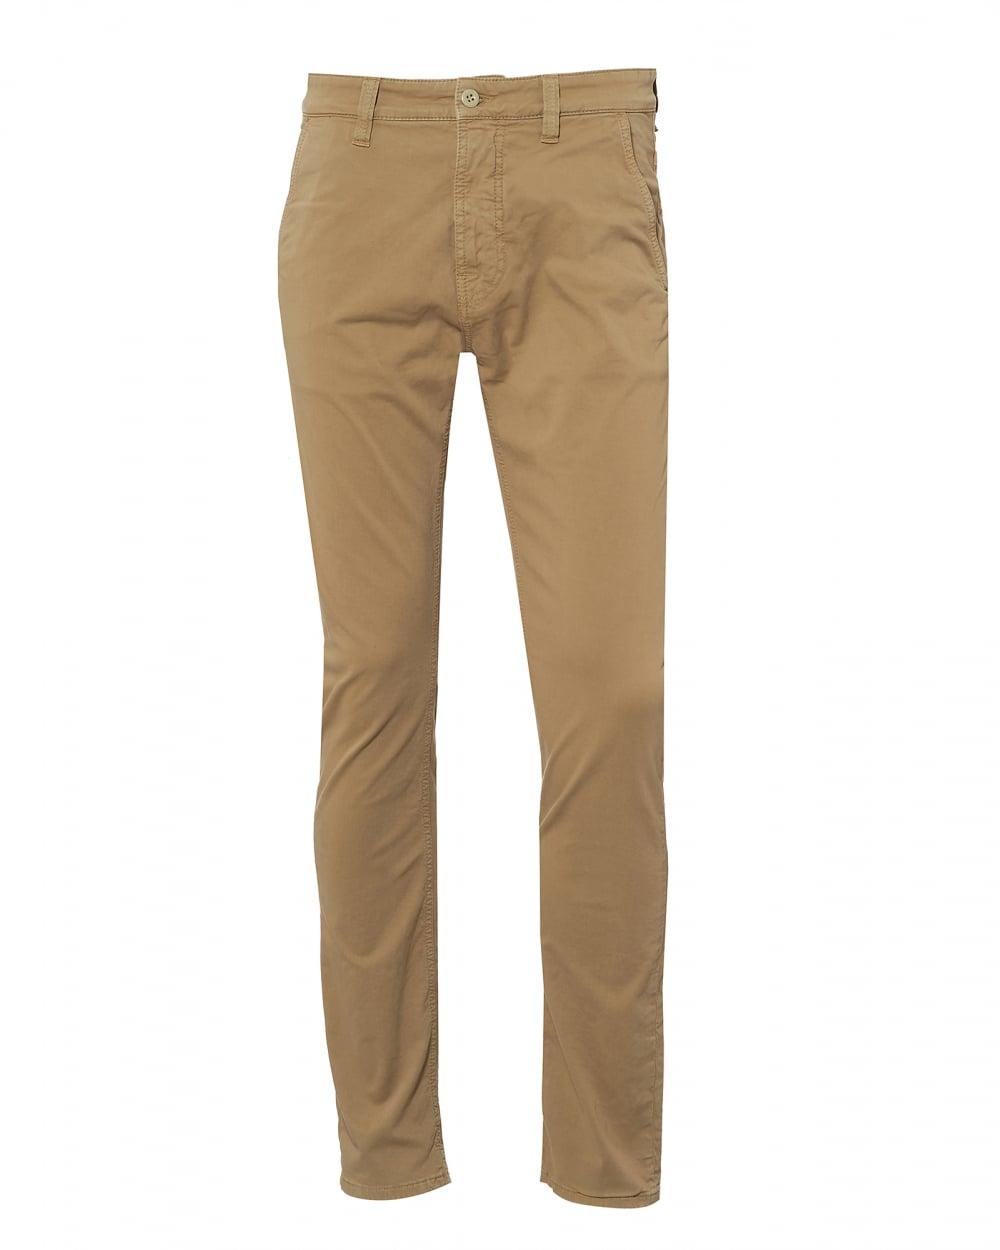 adb94130c3e Nudie Jeans Mens Slim Adam Bunker Chino Jeans, Beige Tapered ...